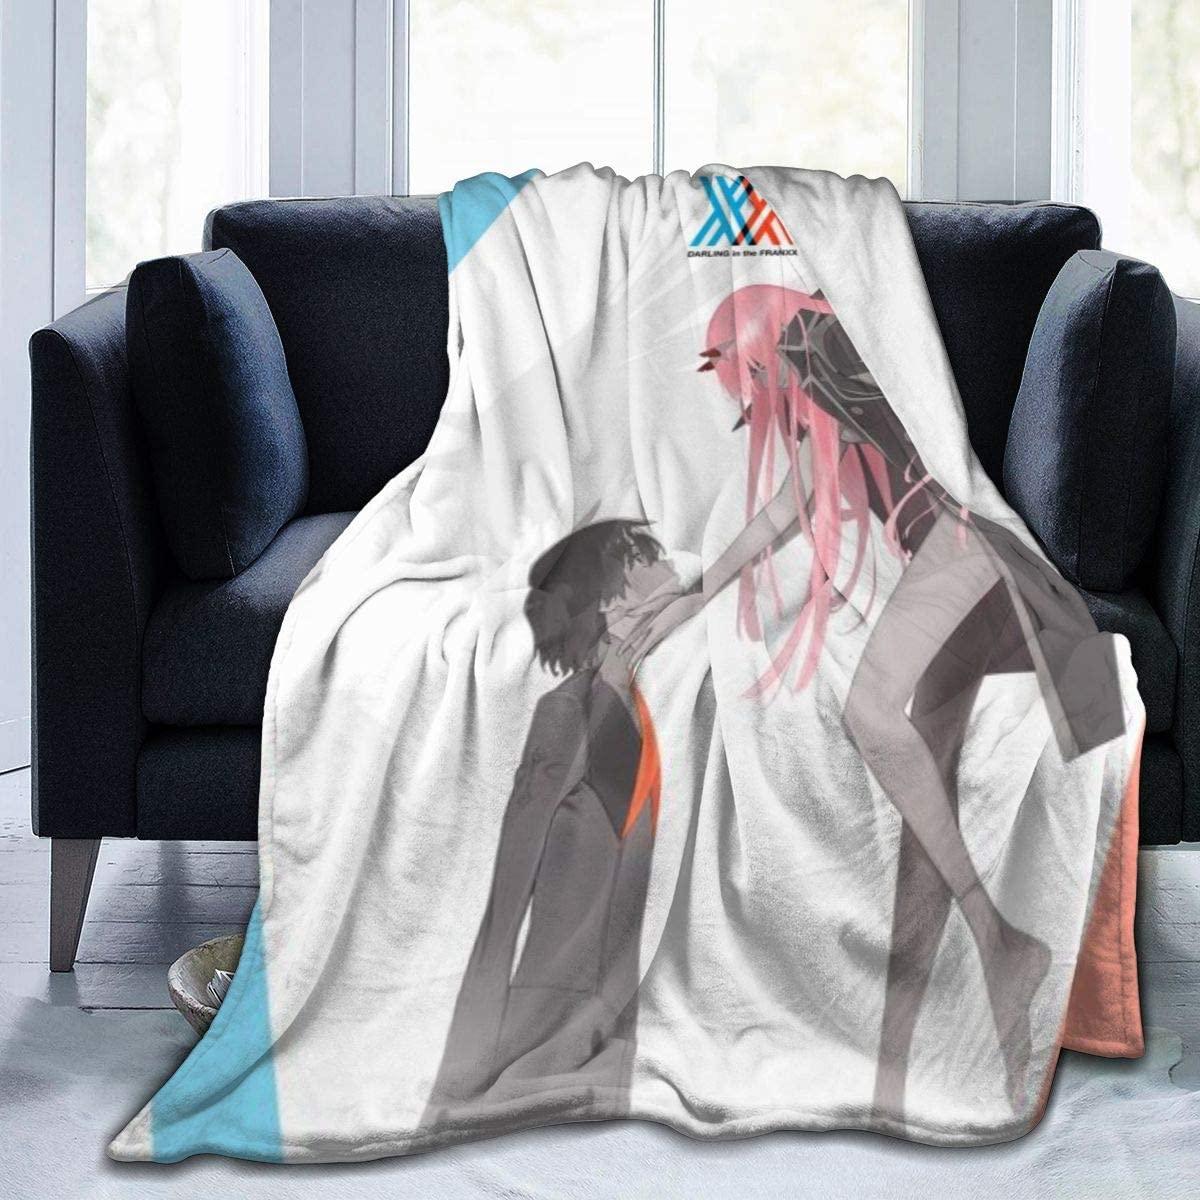 Ddsss Darling in The FRANXX Luxury Flannel Blanket Queen Size Velvet Plush Throw Microfiber Blanket All Season 60x50 Inch